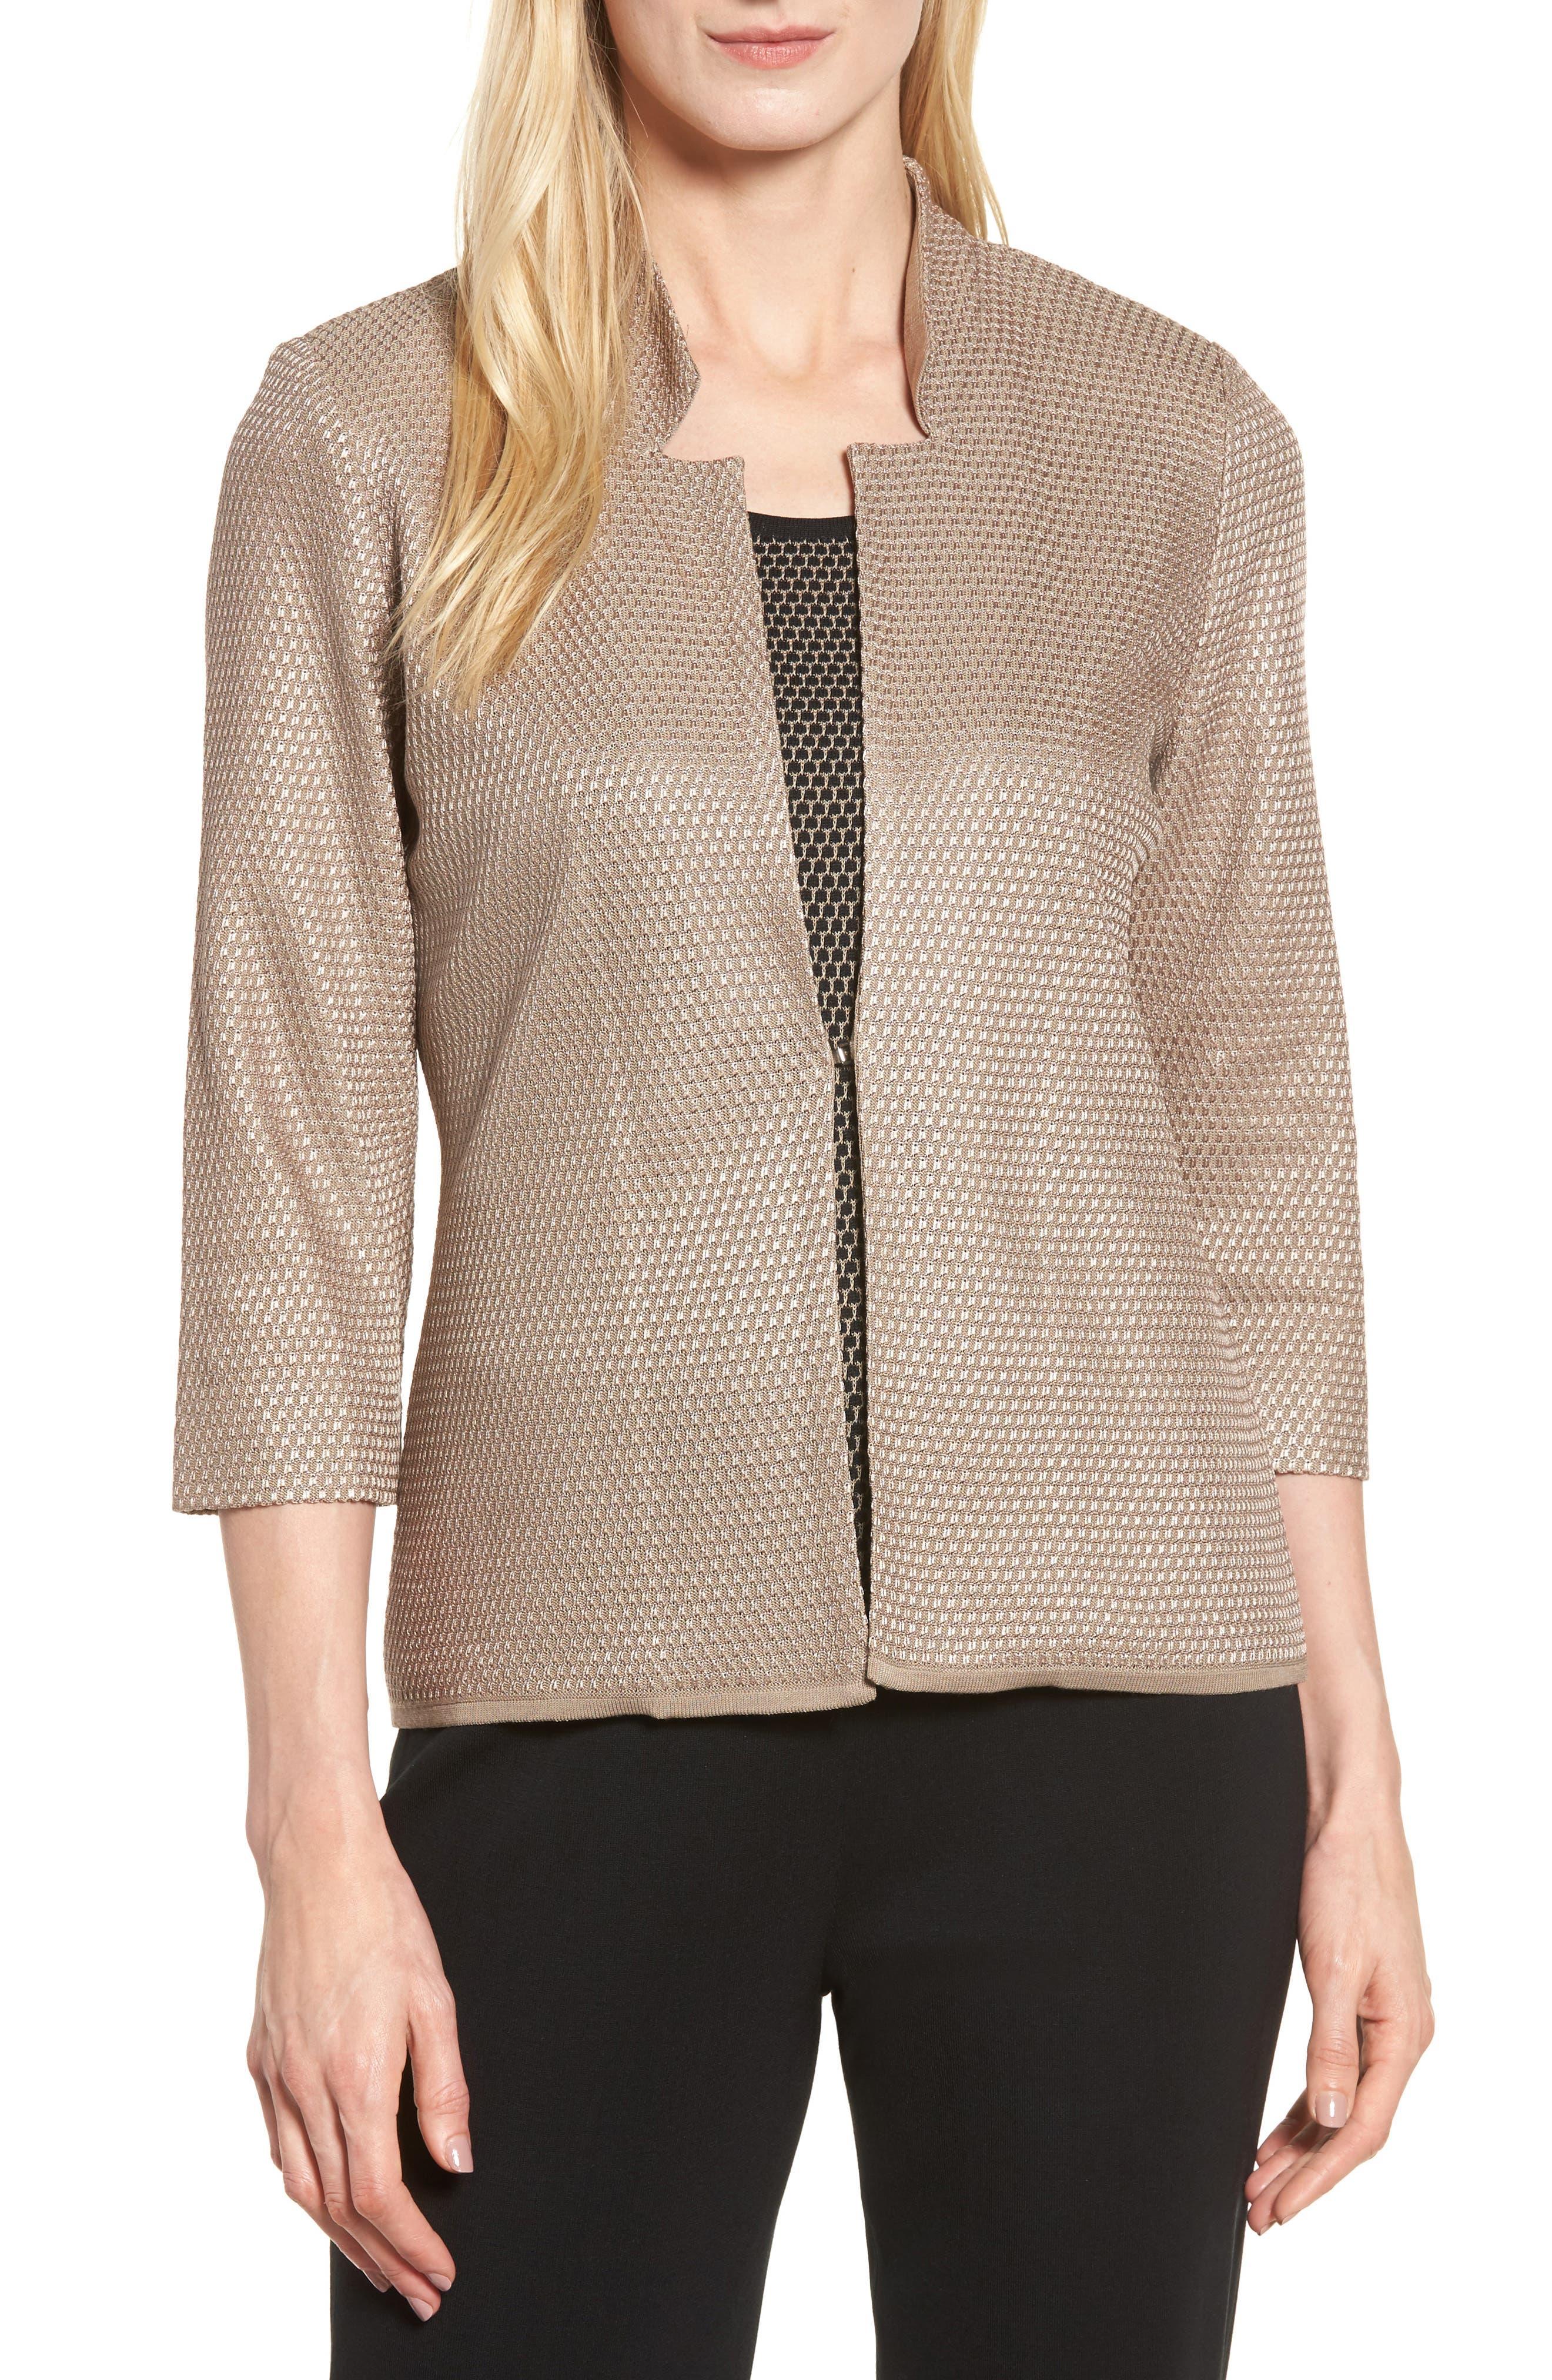 Alternate Image 1 Selected - Ming Wang Textured Knit Jacket